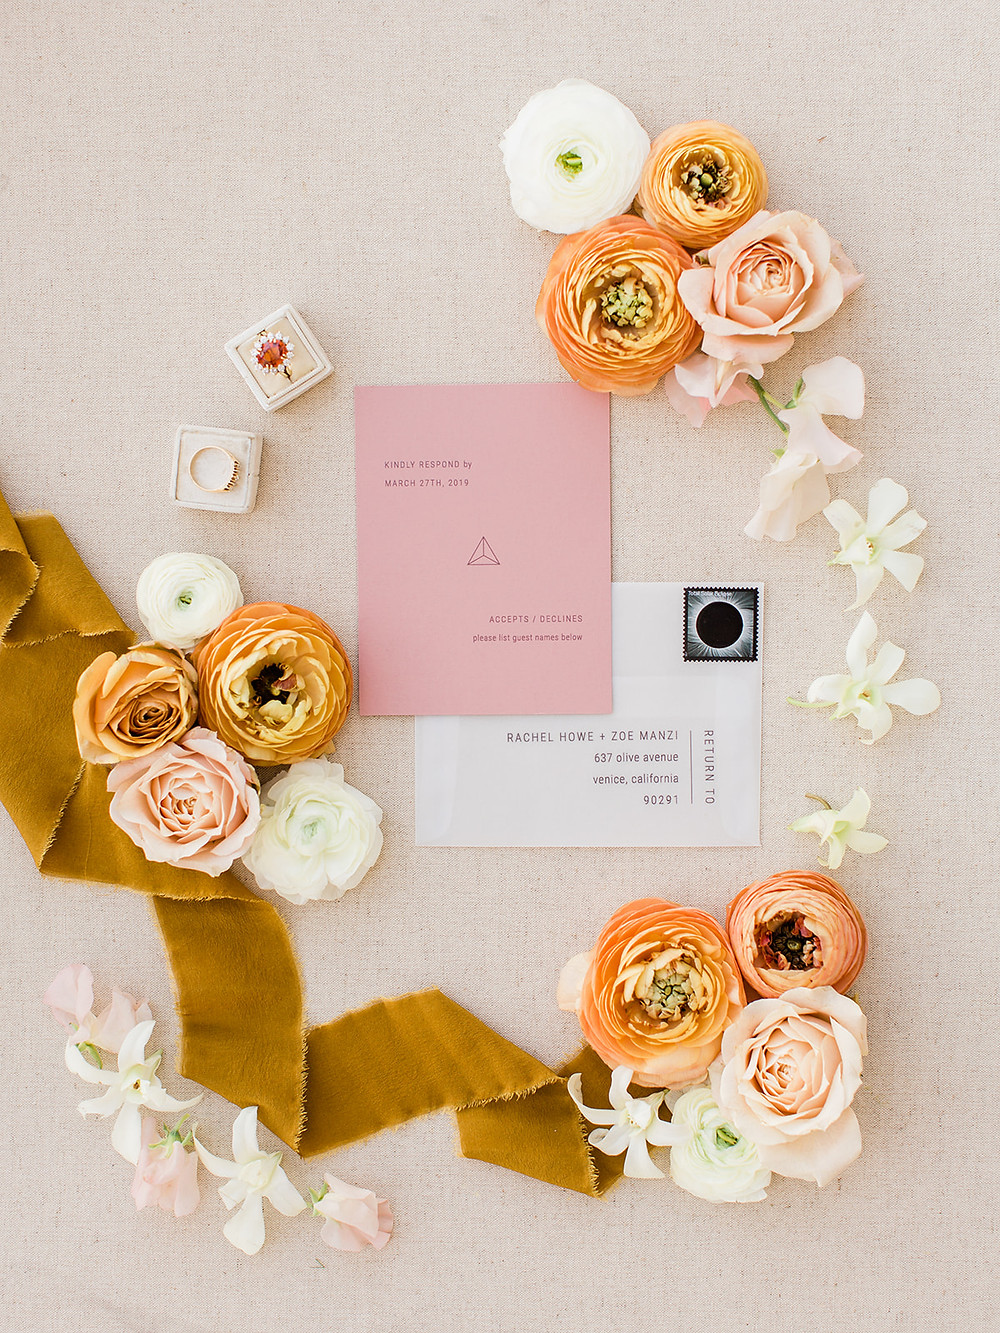 Modern Moroccan Desert Glam Editorial - LGBTQ Wedding Editoiral - Wedding Design Inspiration - Muted Desert Tones - Modern Glam Jungle Chic- invitation suite - ring